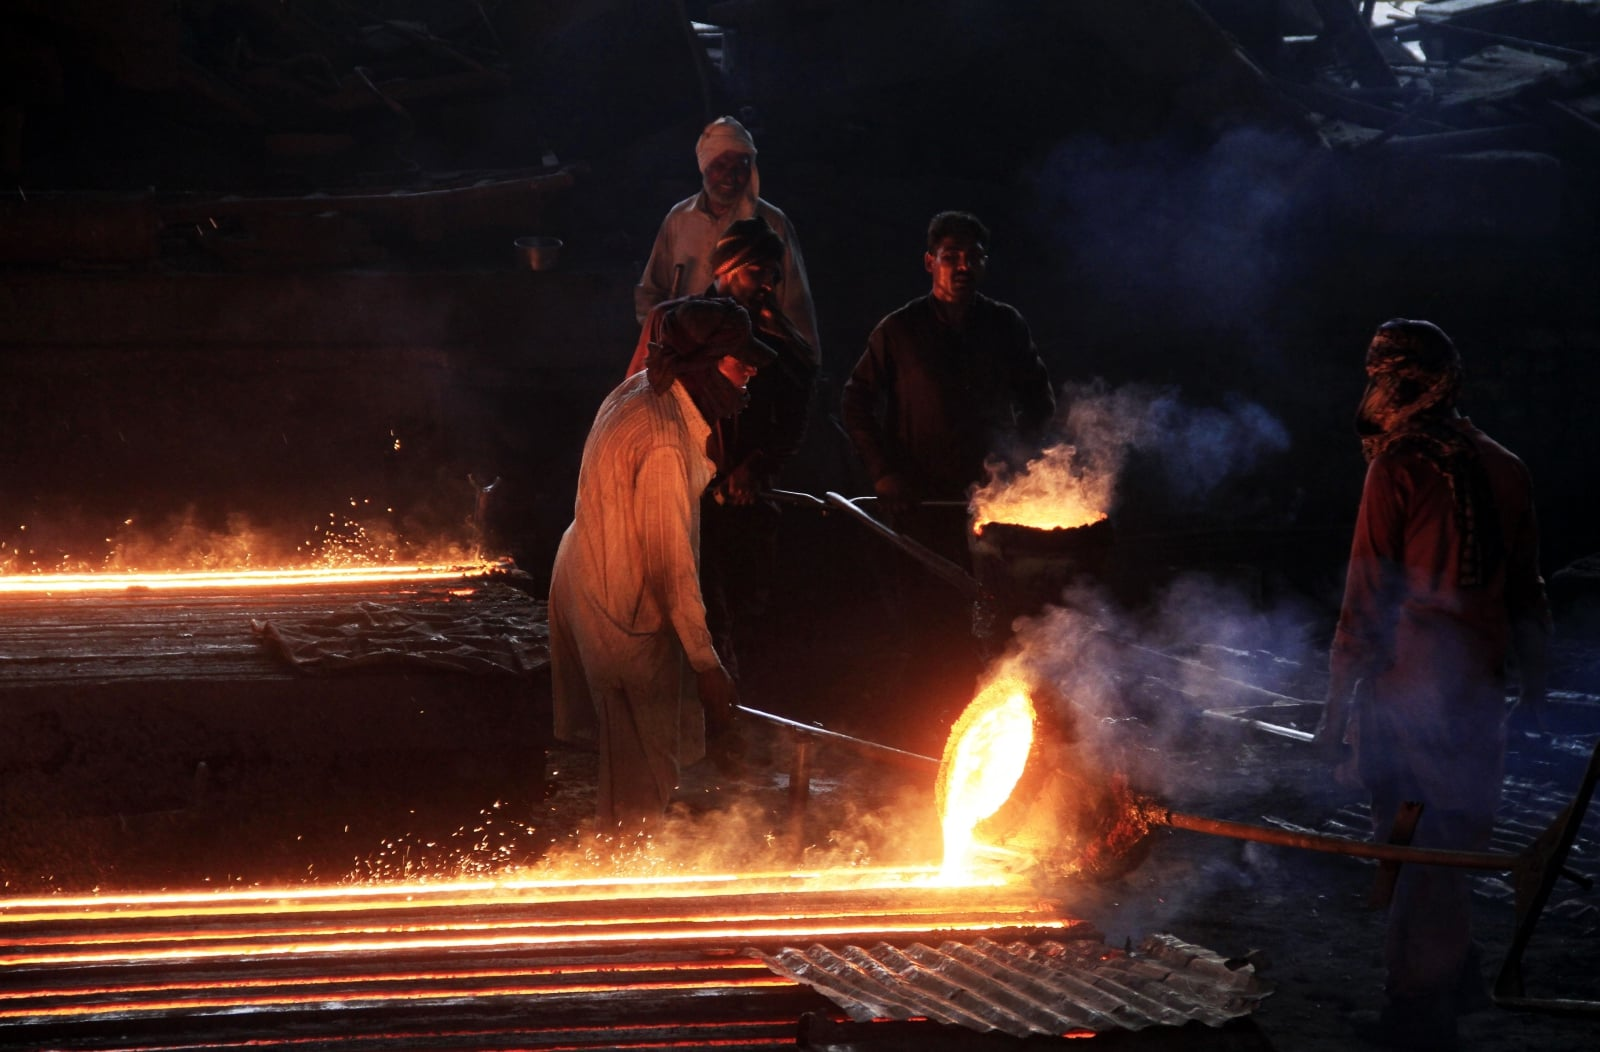 Pakistan EPA/RAHAT DAR